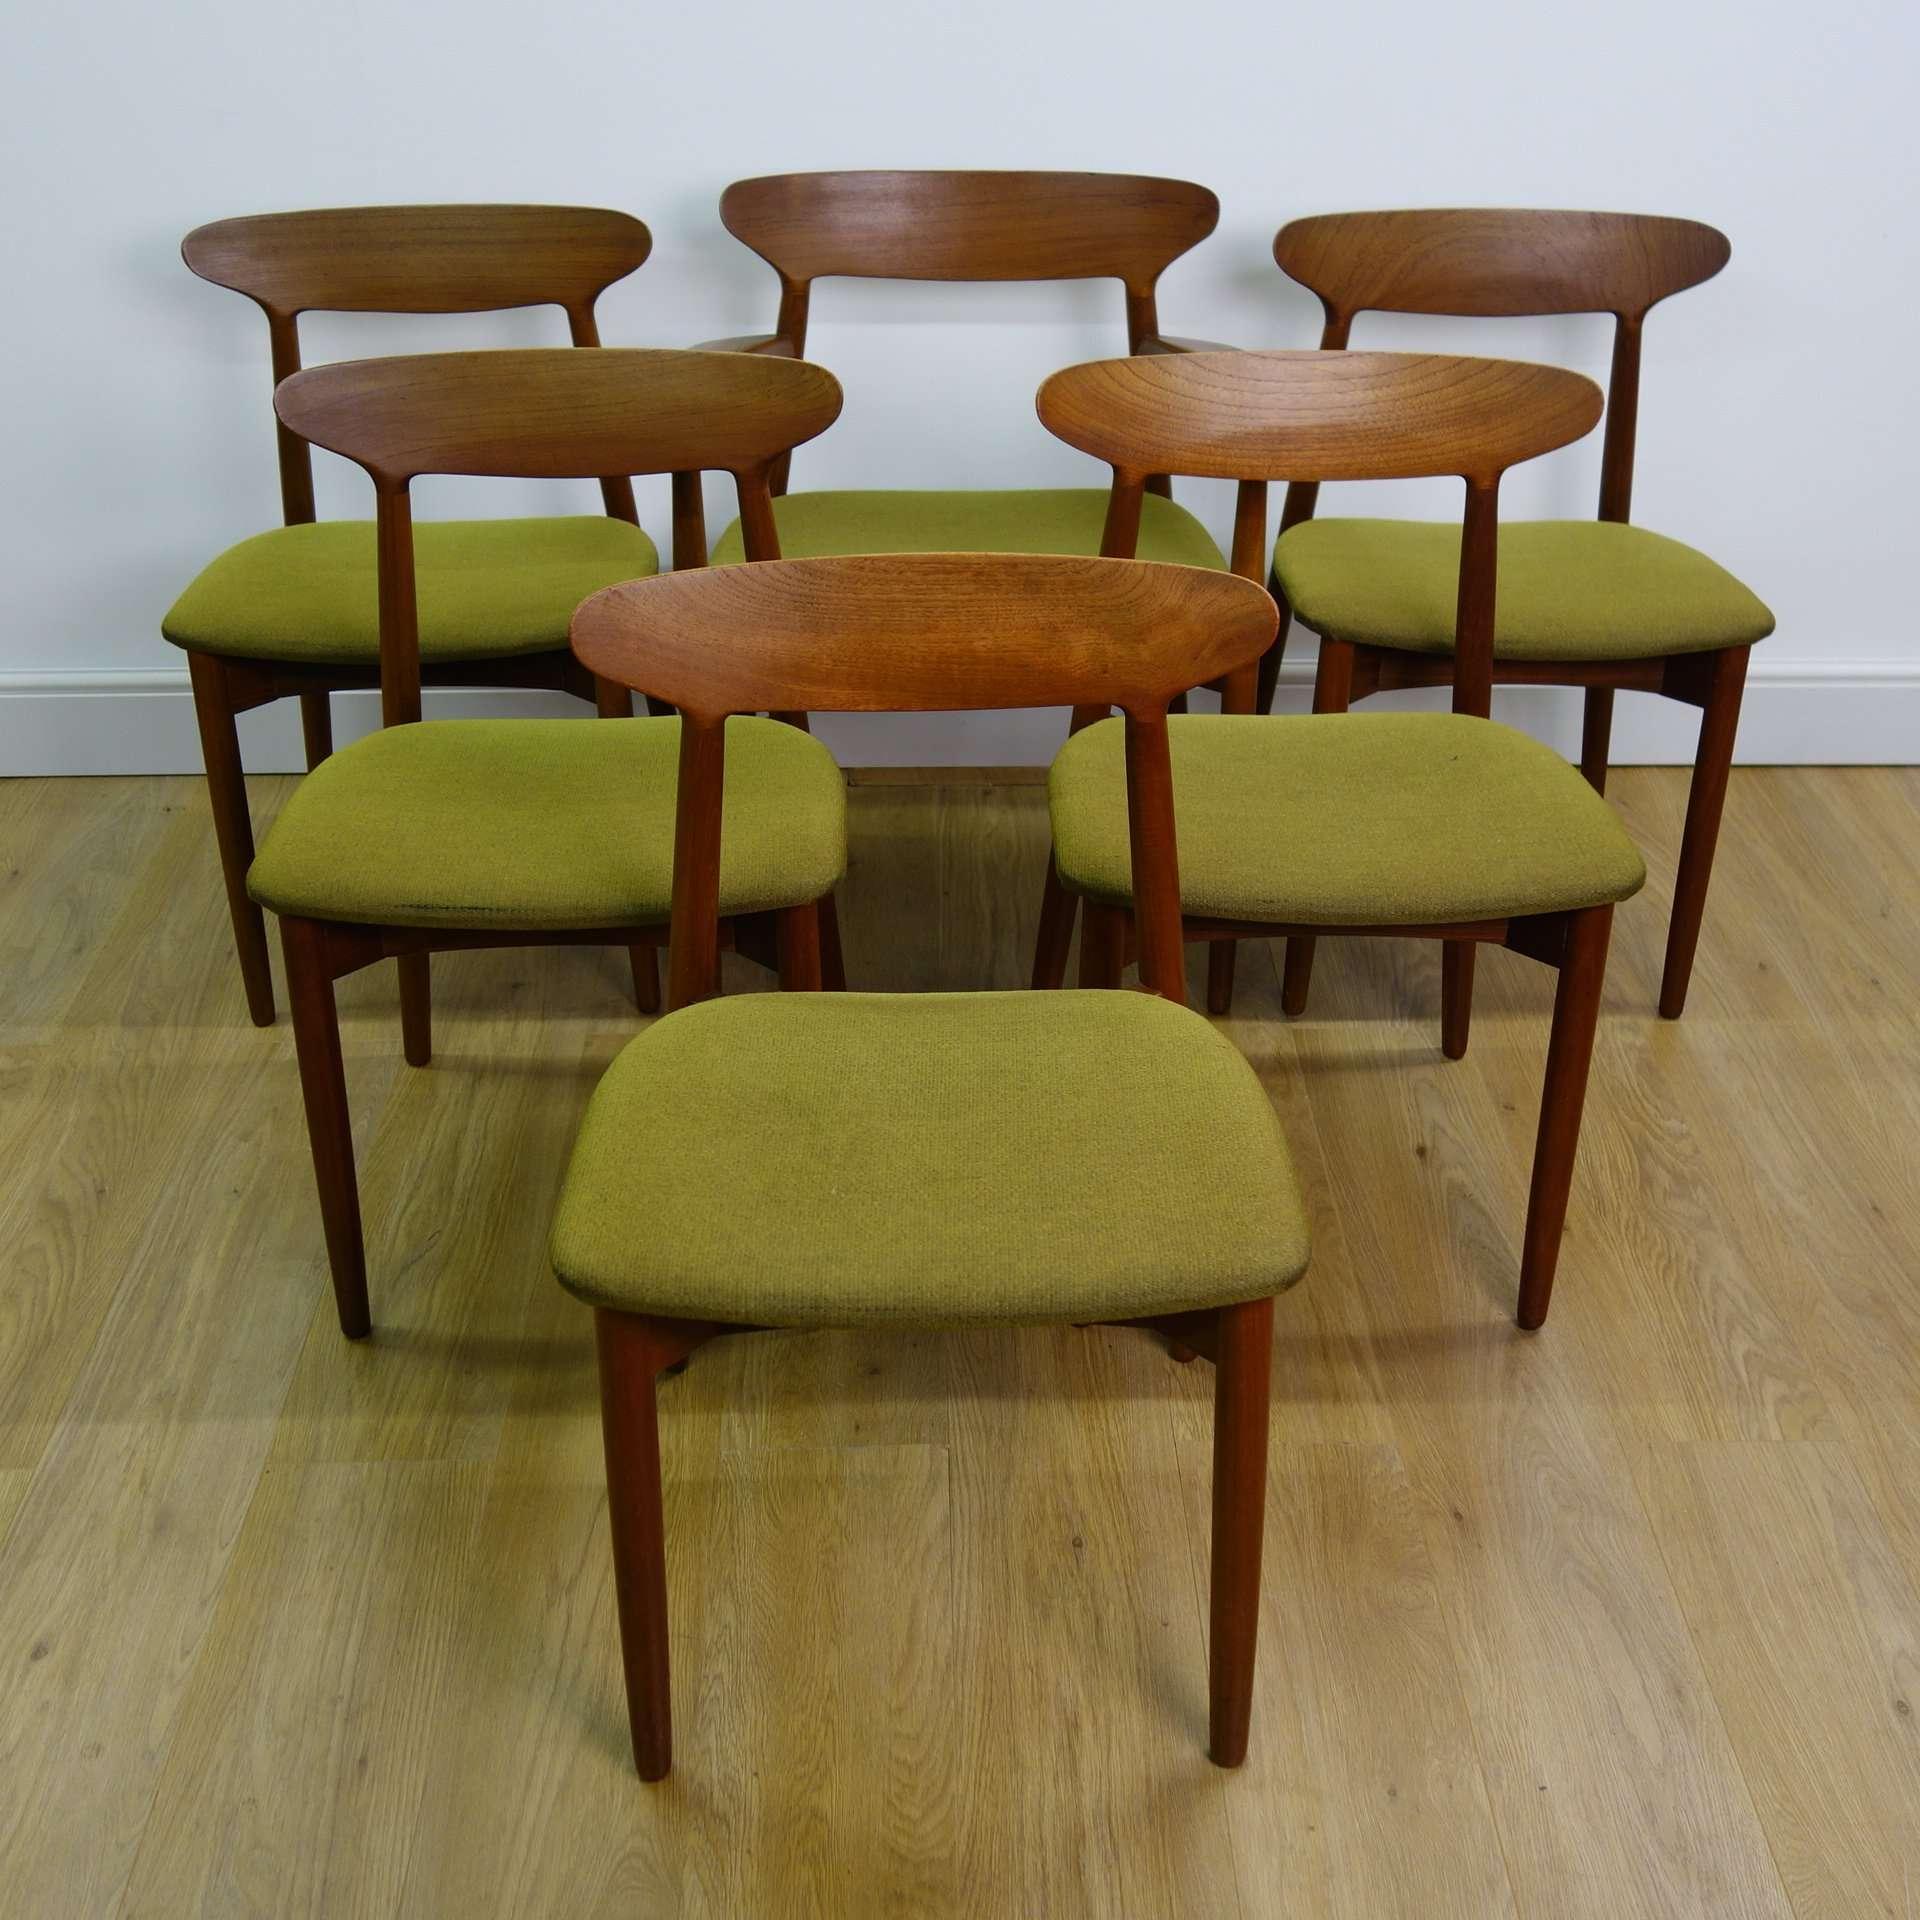 Danish Teak Dining Chairs By Harry Ostergaard Mark Parrish Mid Century Modern